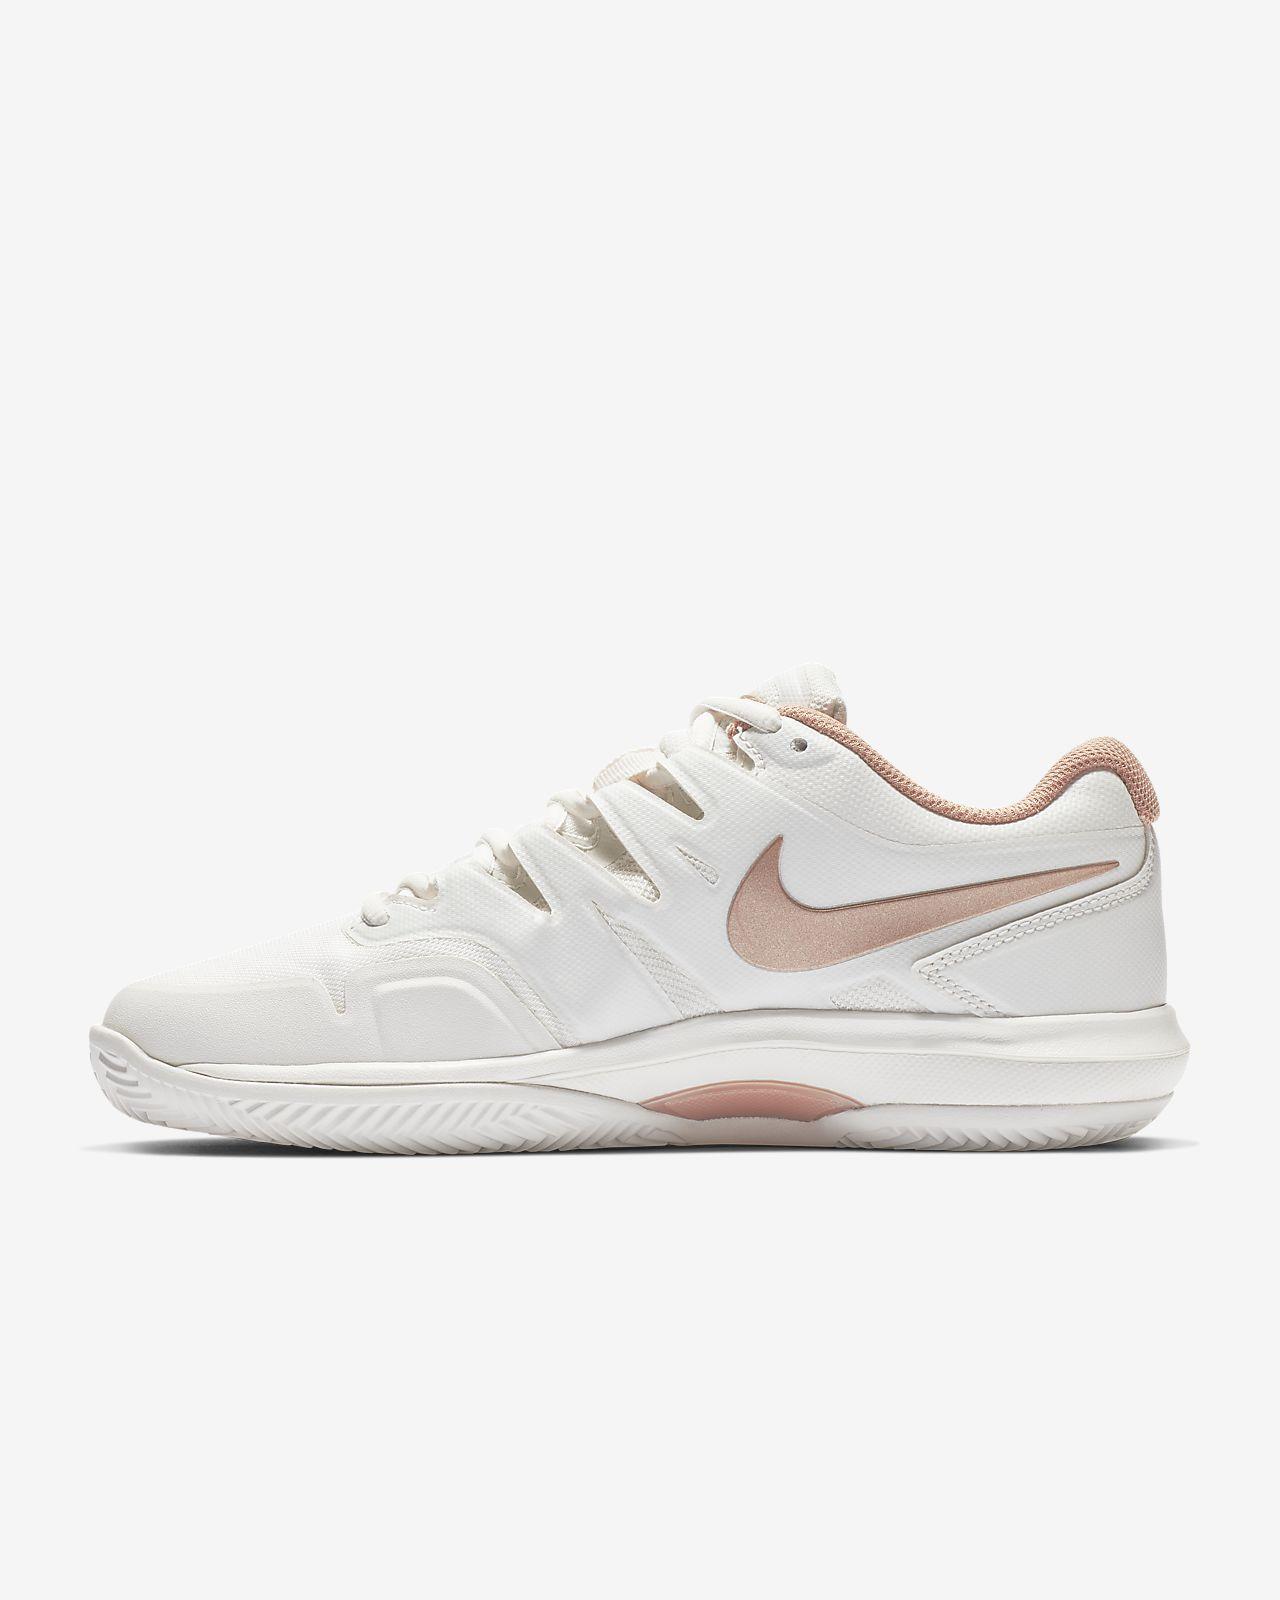 Sapatilhas de ténis Nike Air Zoom Prestige Clay para mulher